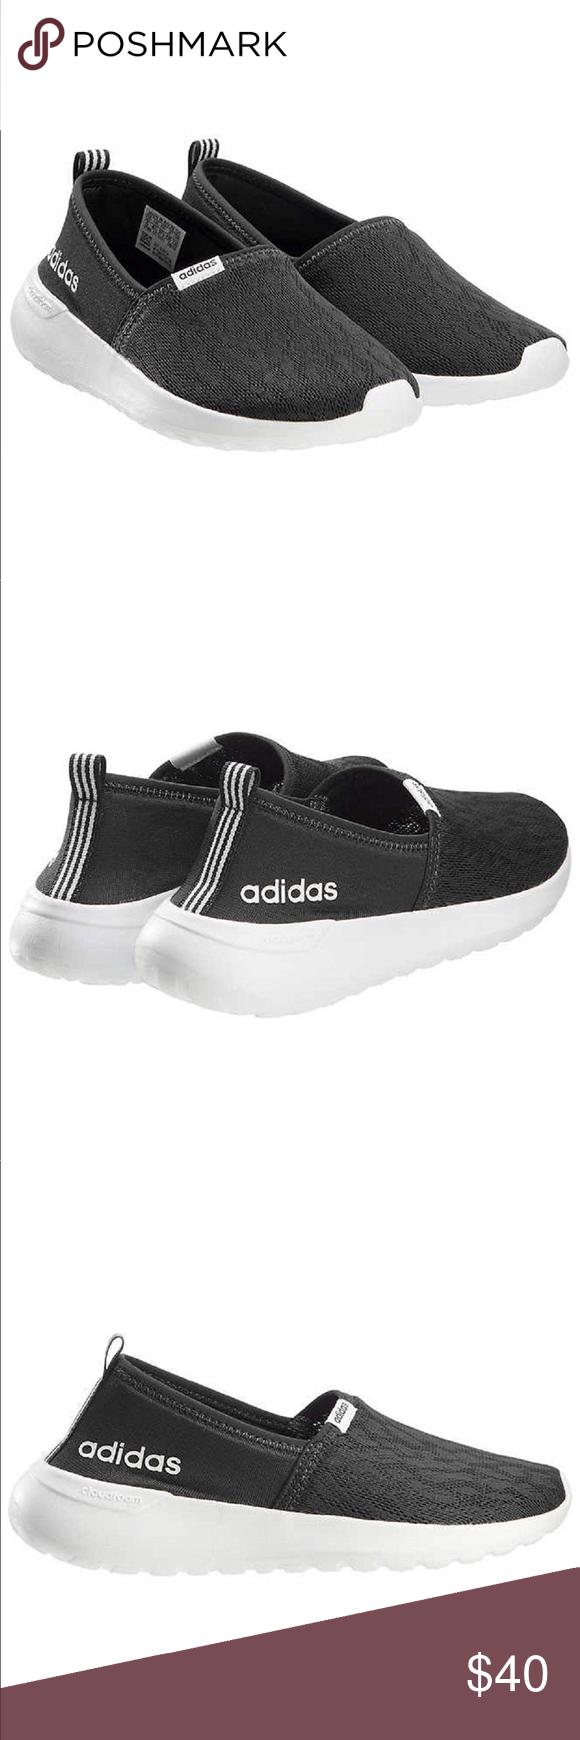 Black Adidas Memory Foam Slip On